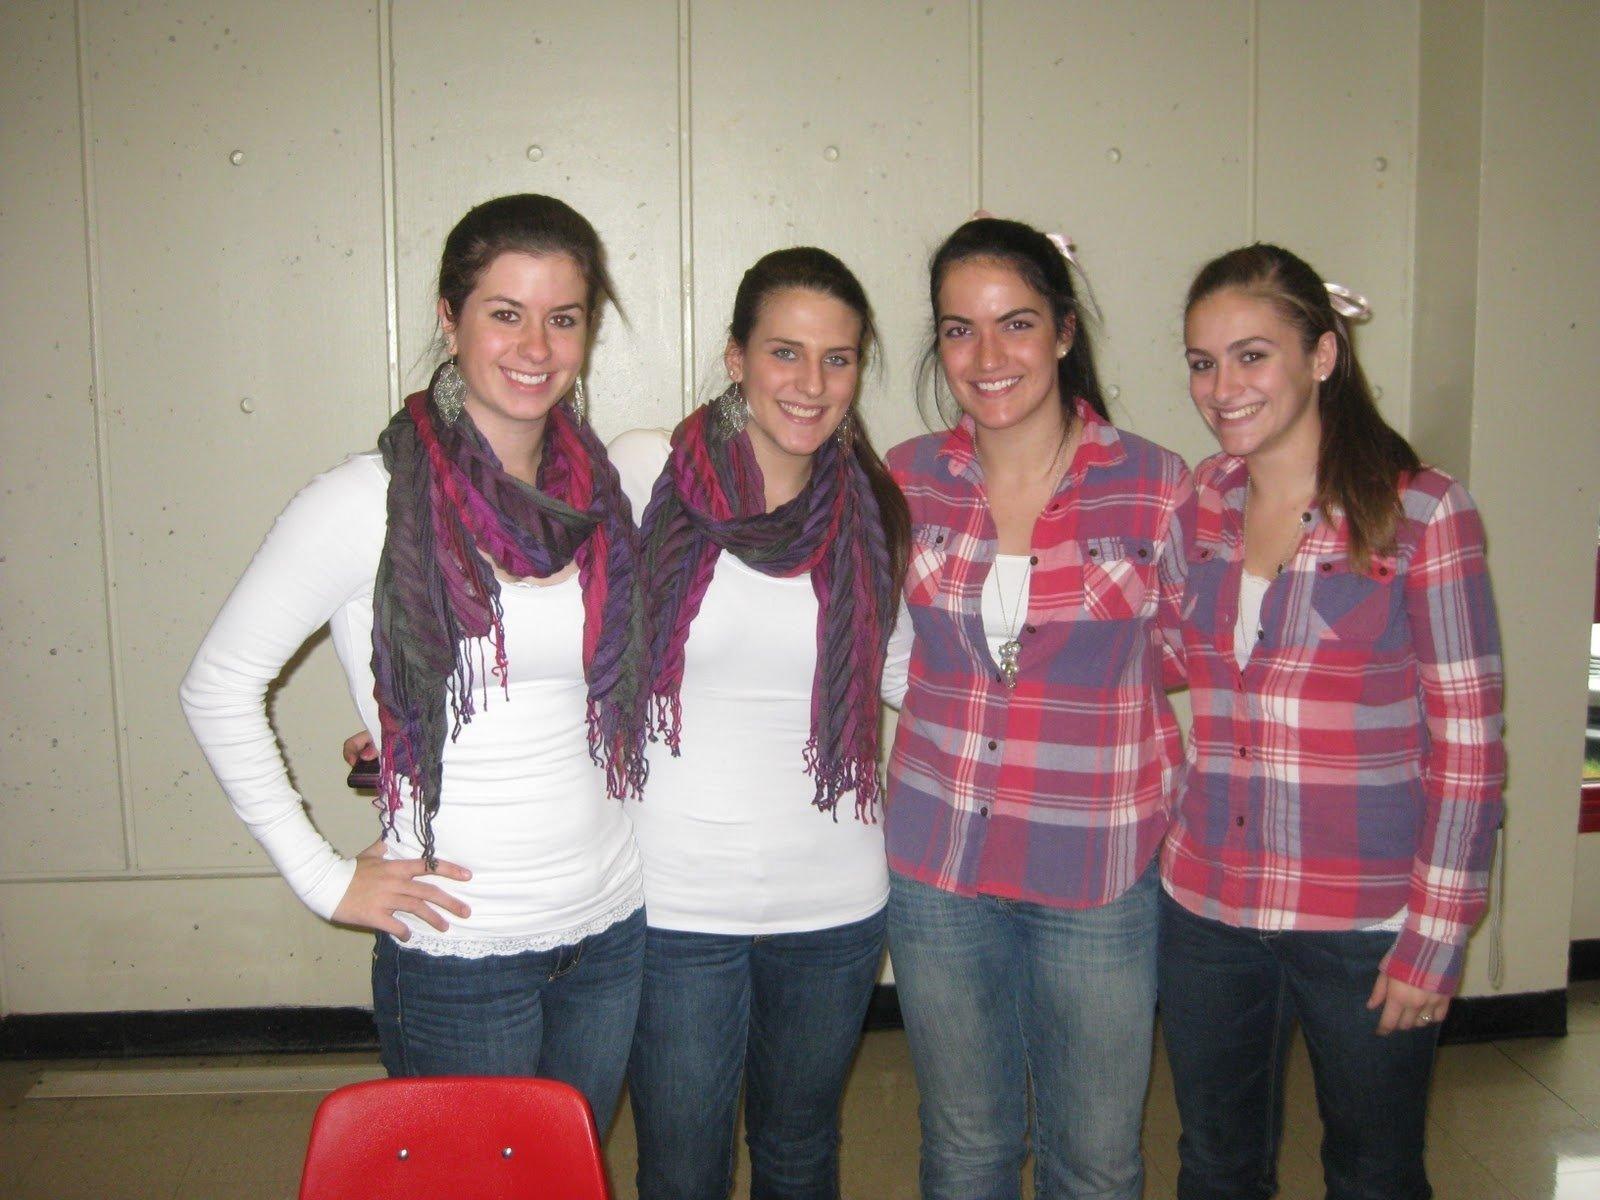 10 Elegant Cute Ideas For Twin Day burlington high school principals blog day one of spirit week 4 2020